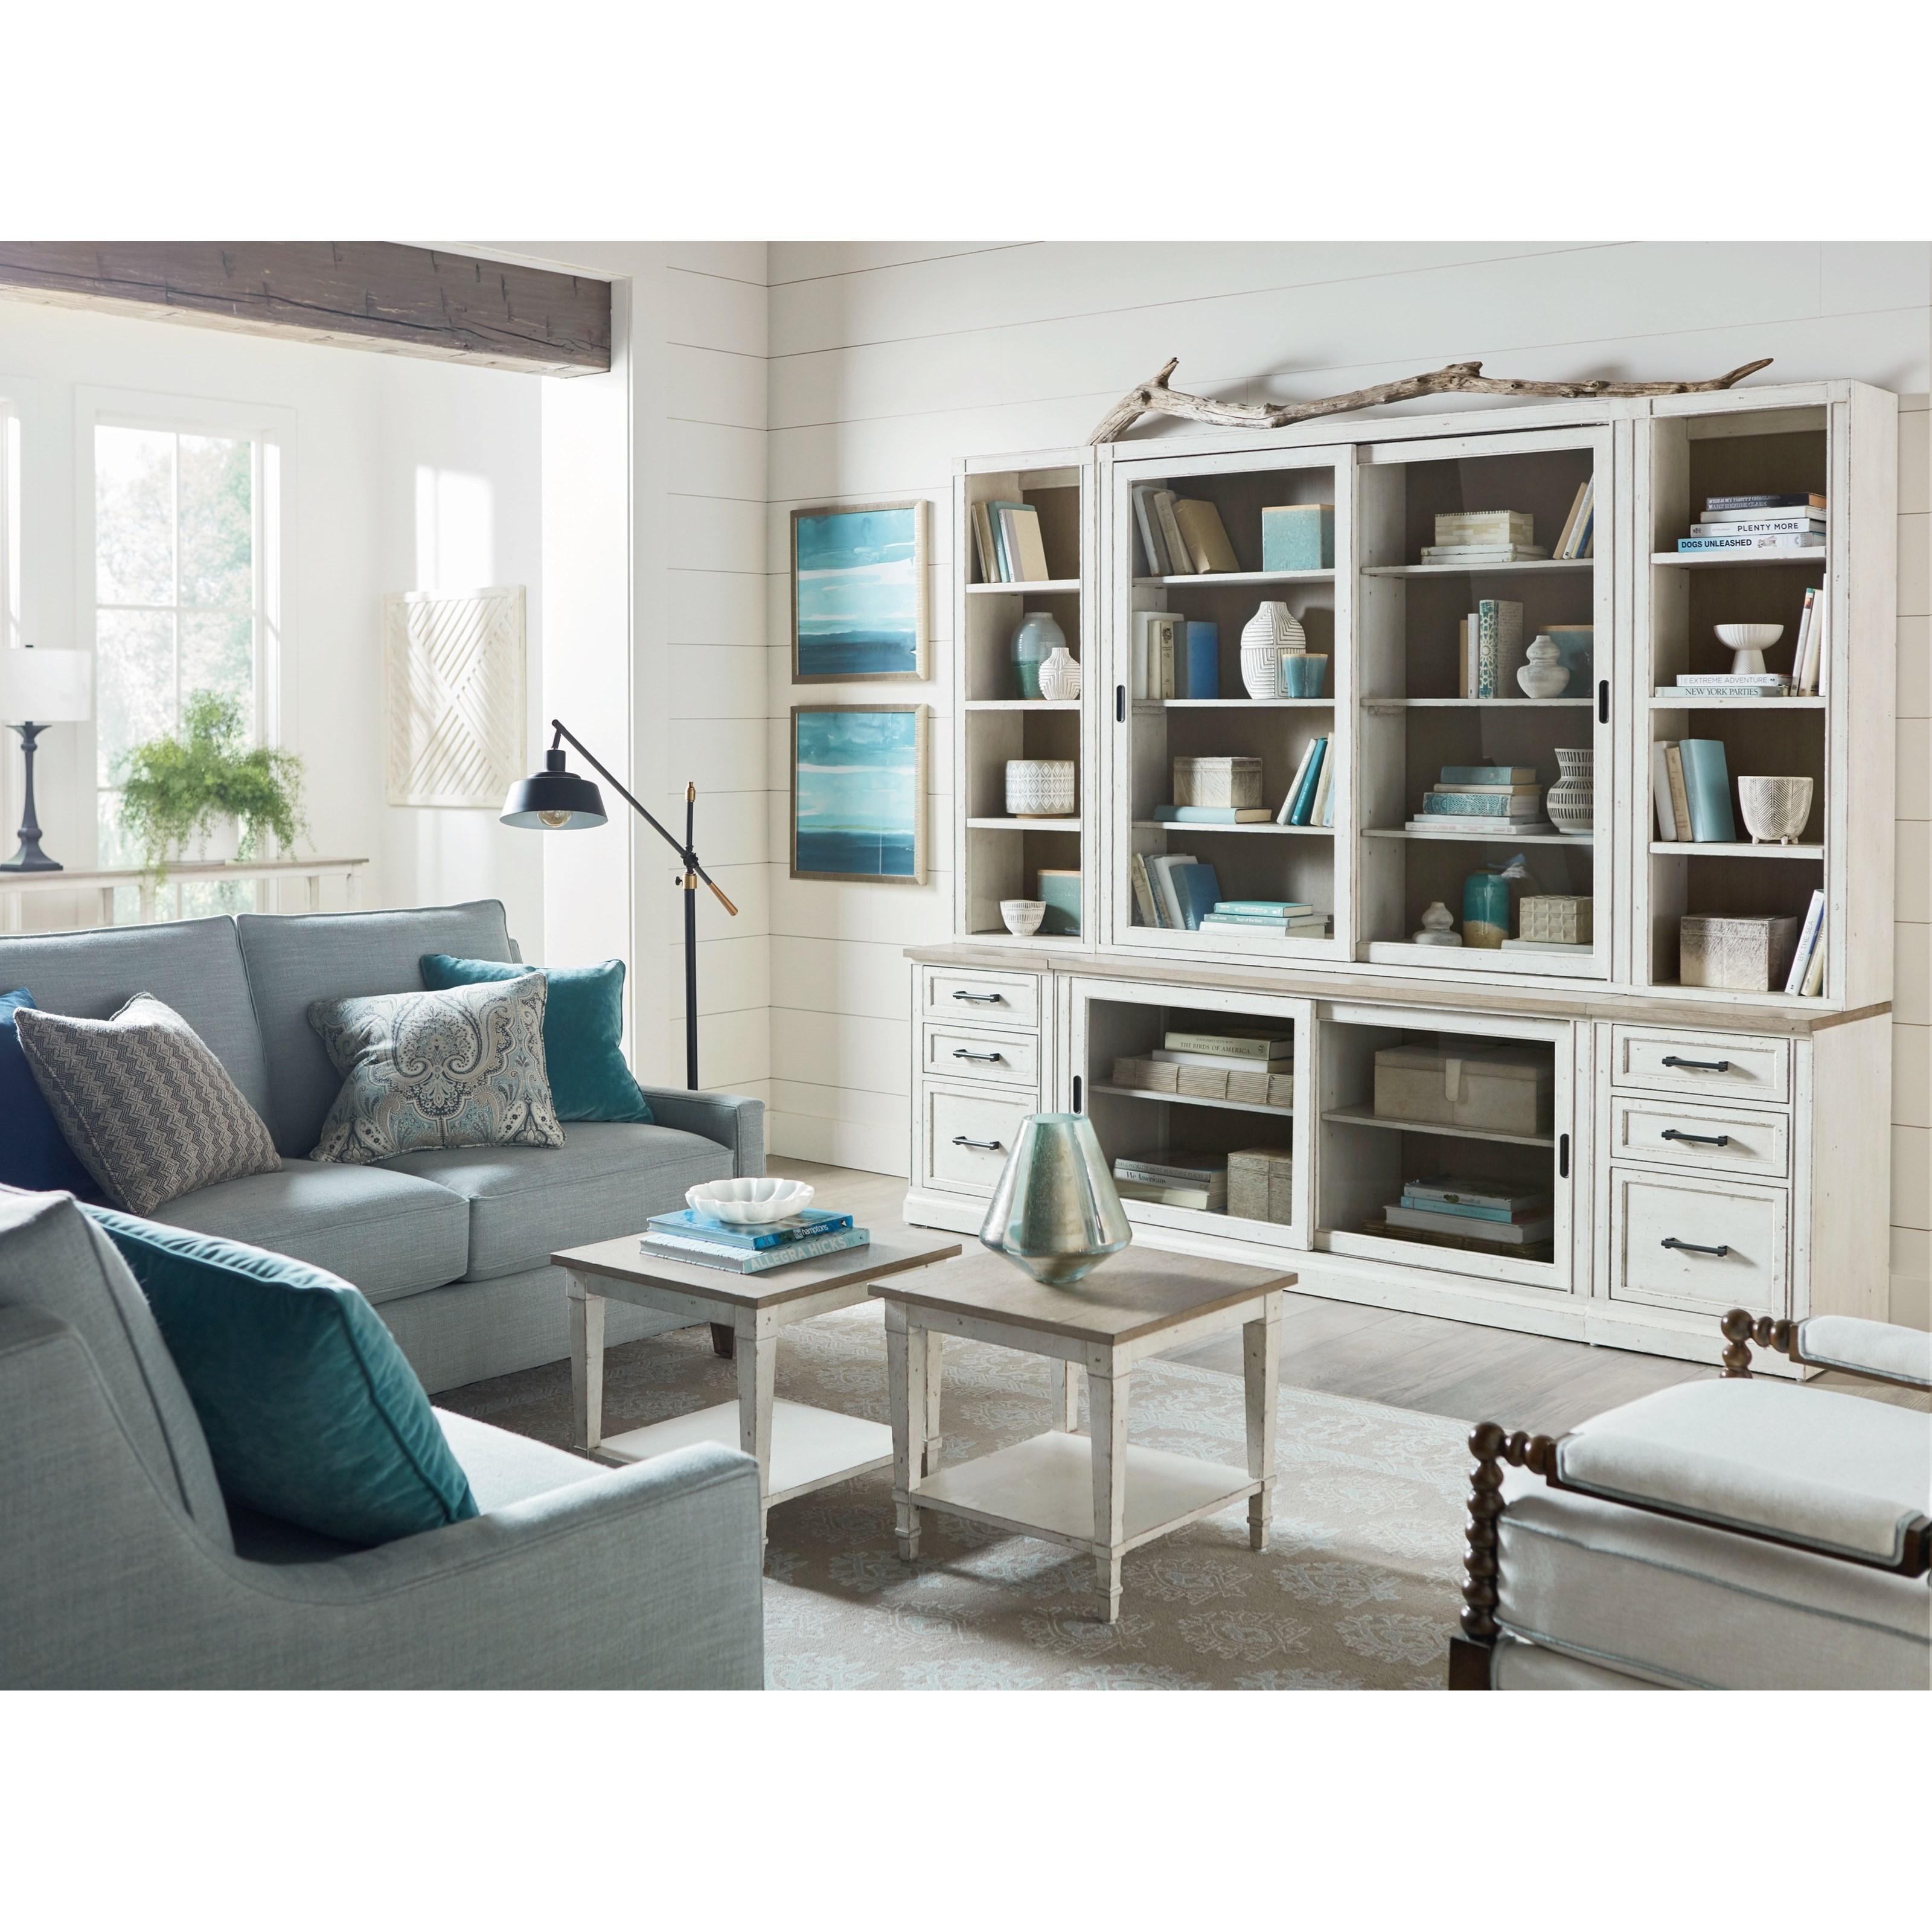 Bella Wall Bookcase by Bassett at Suburban Furniture